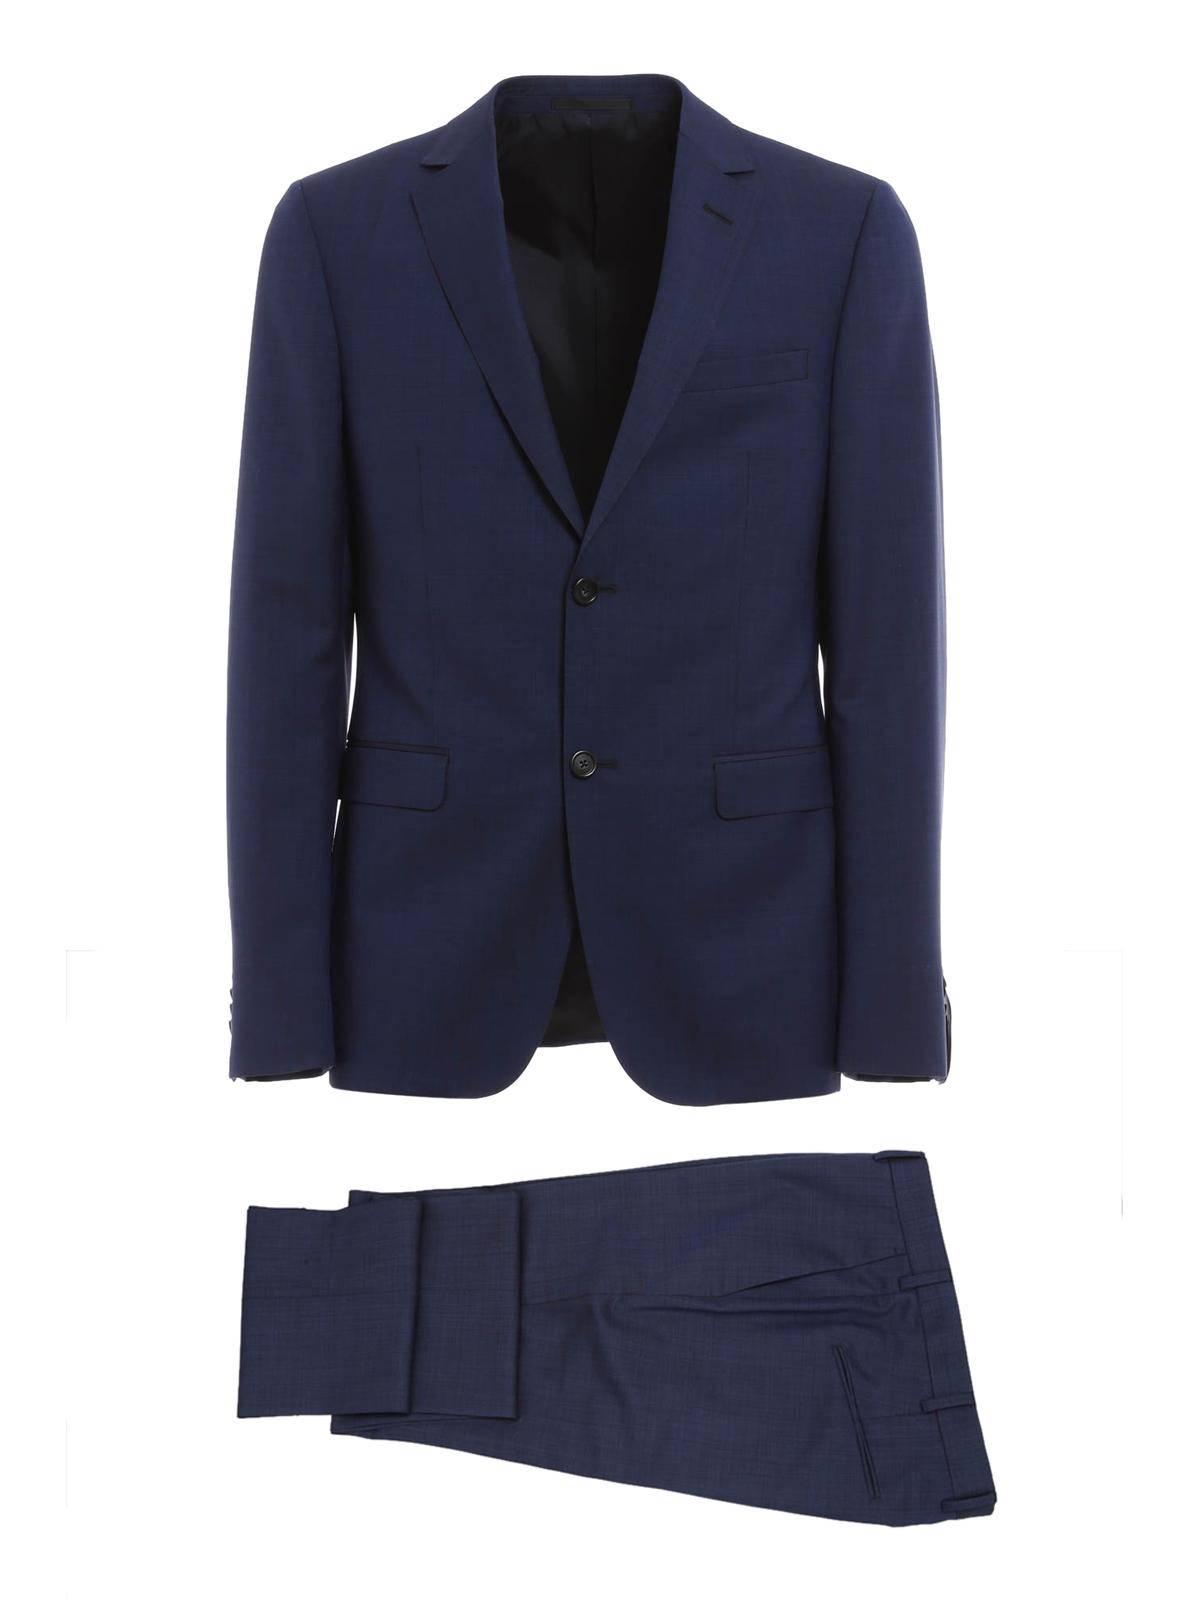 Ermenegildo Zegna Wool And Mohair Tailored Suit Formal